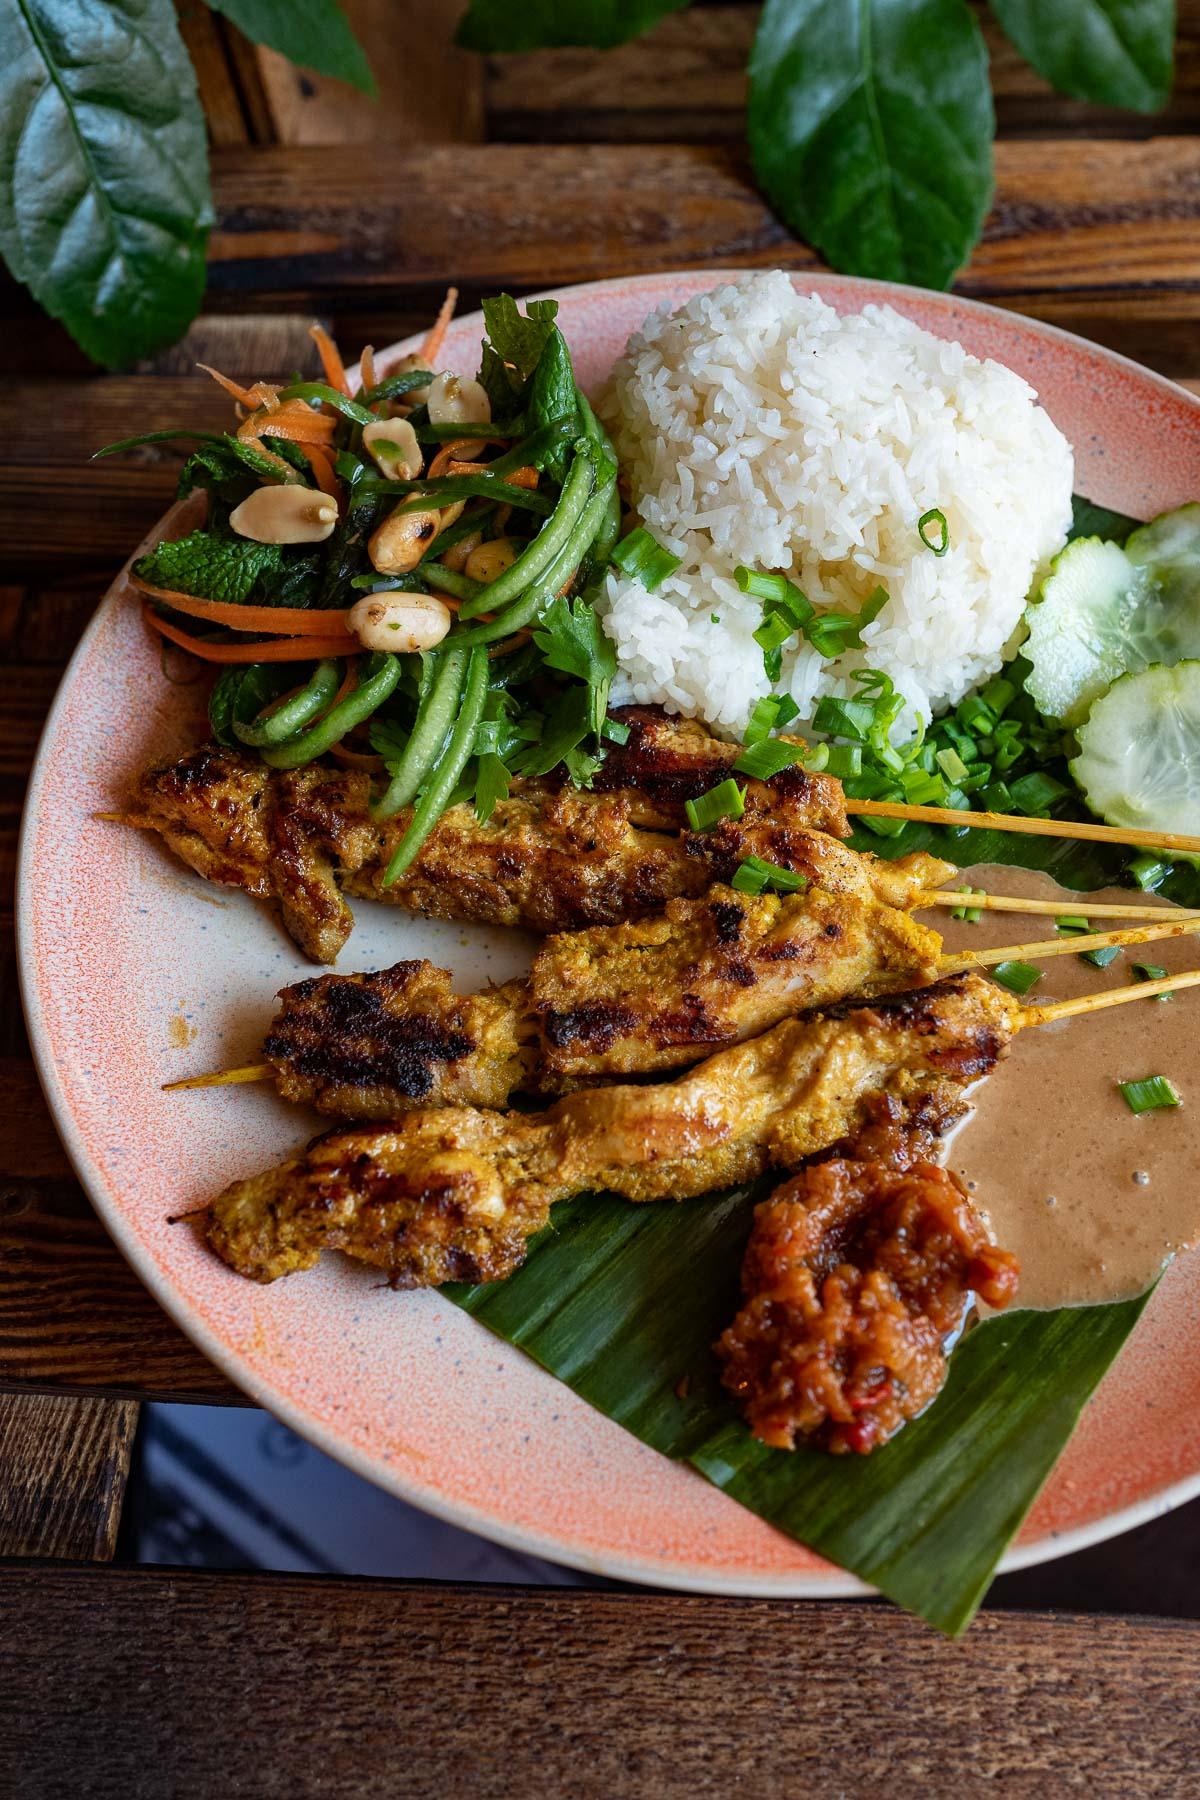 grillowane szaszłyki z orzechowym sosem – sate ayam bumbu kacang